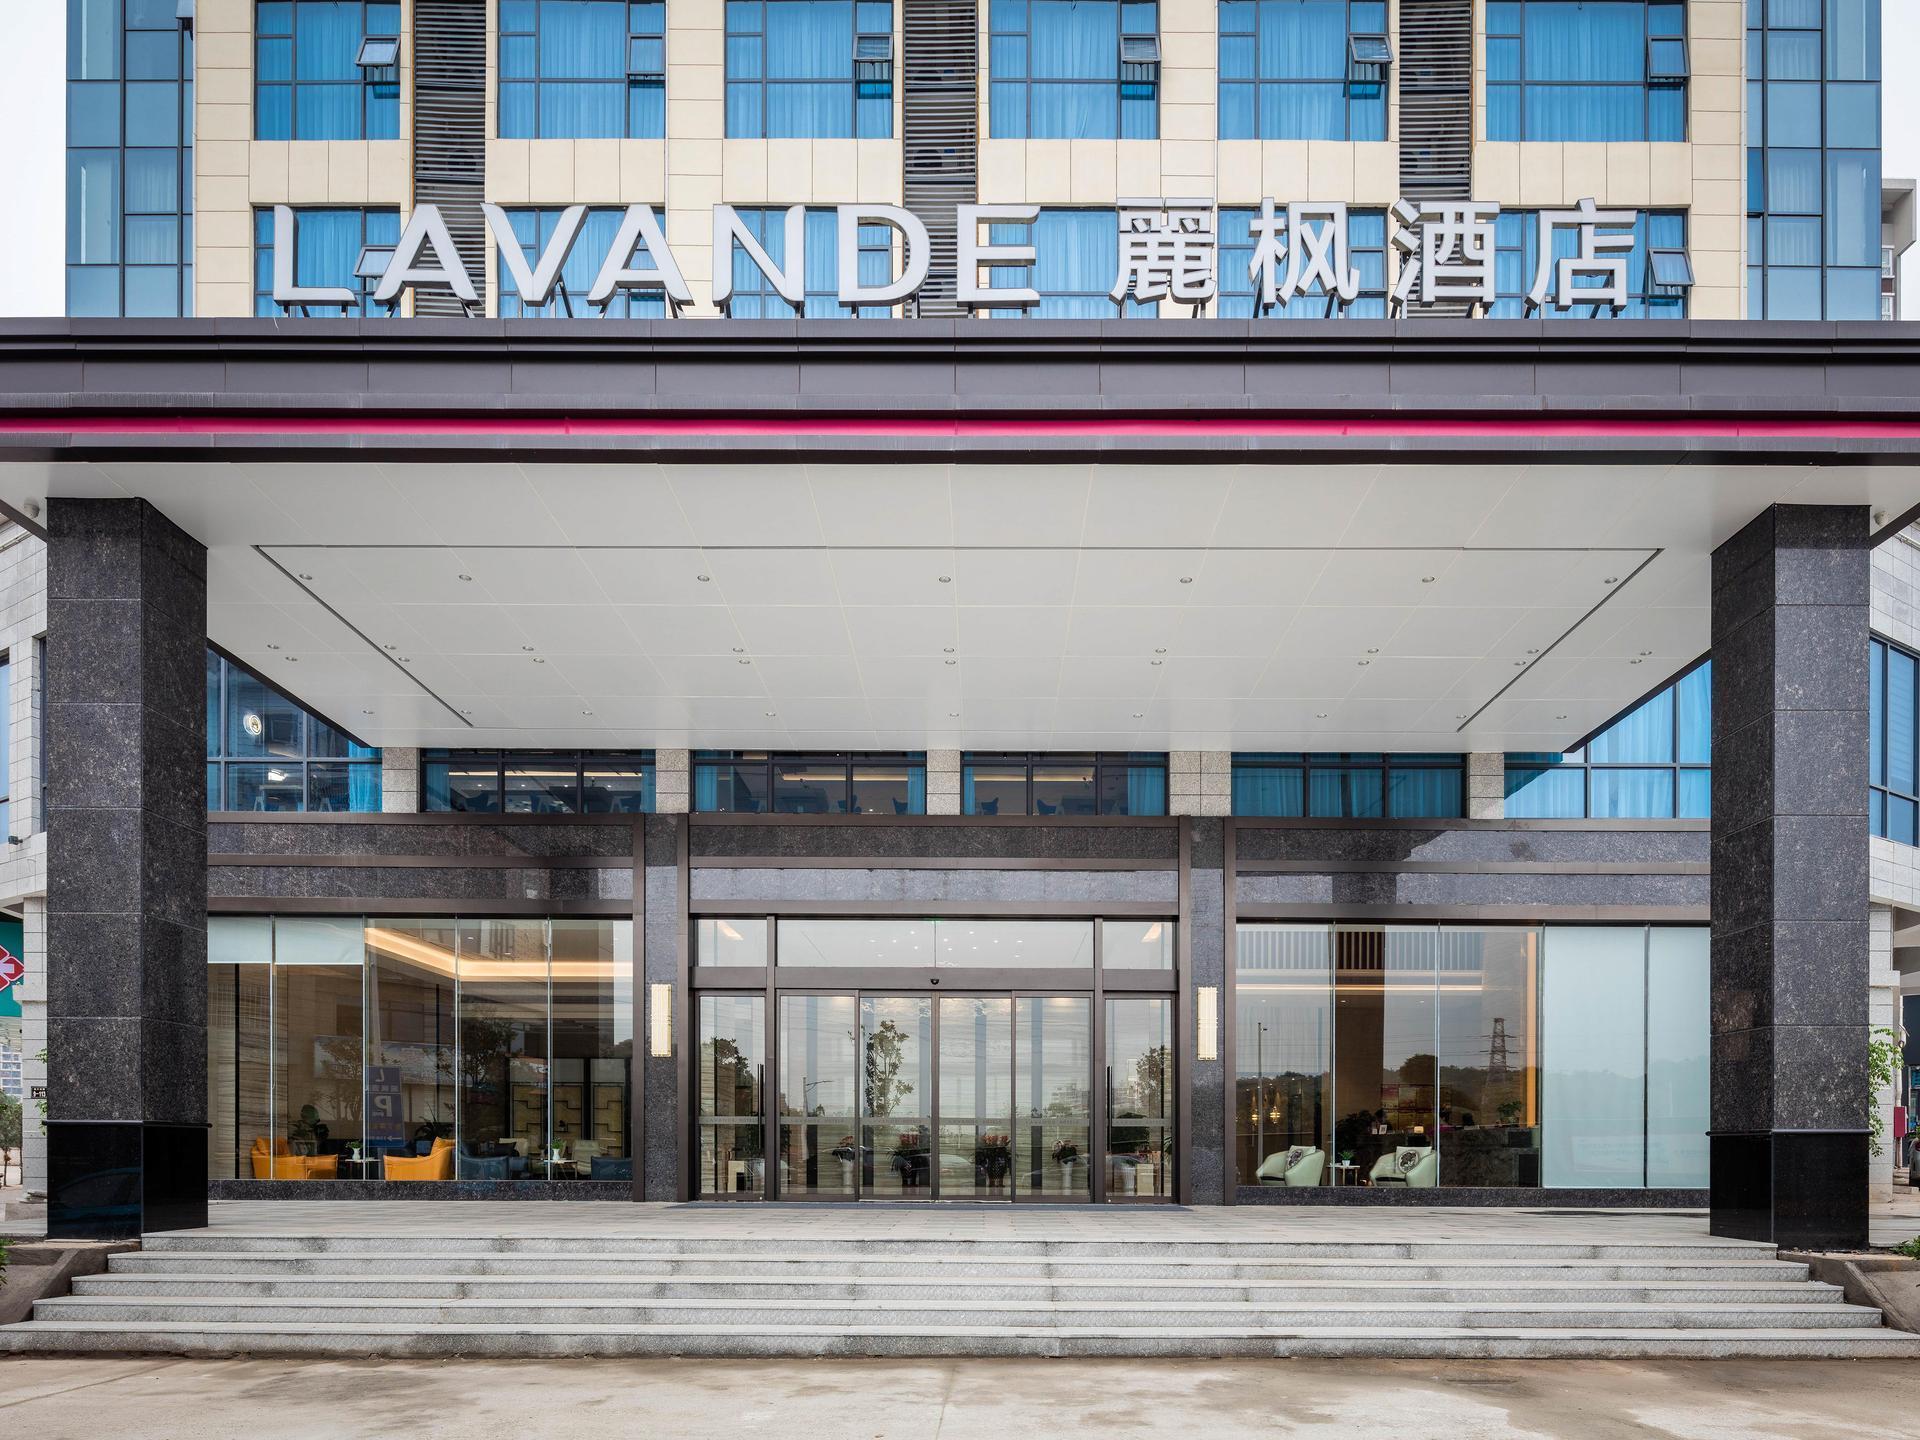 Lavande Hotel�Gangzhou Railway Station